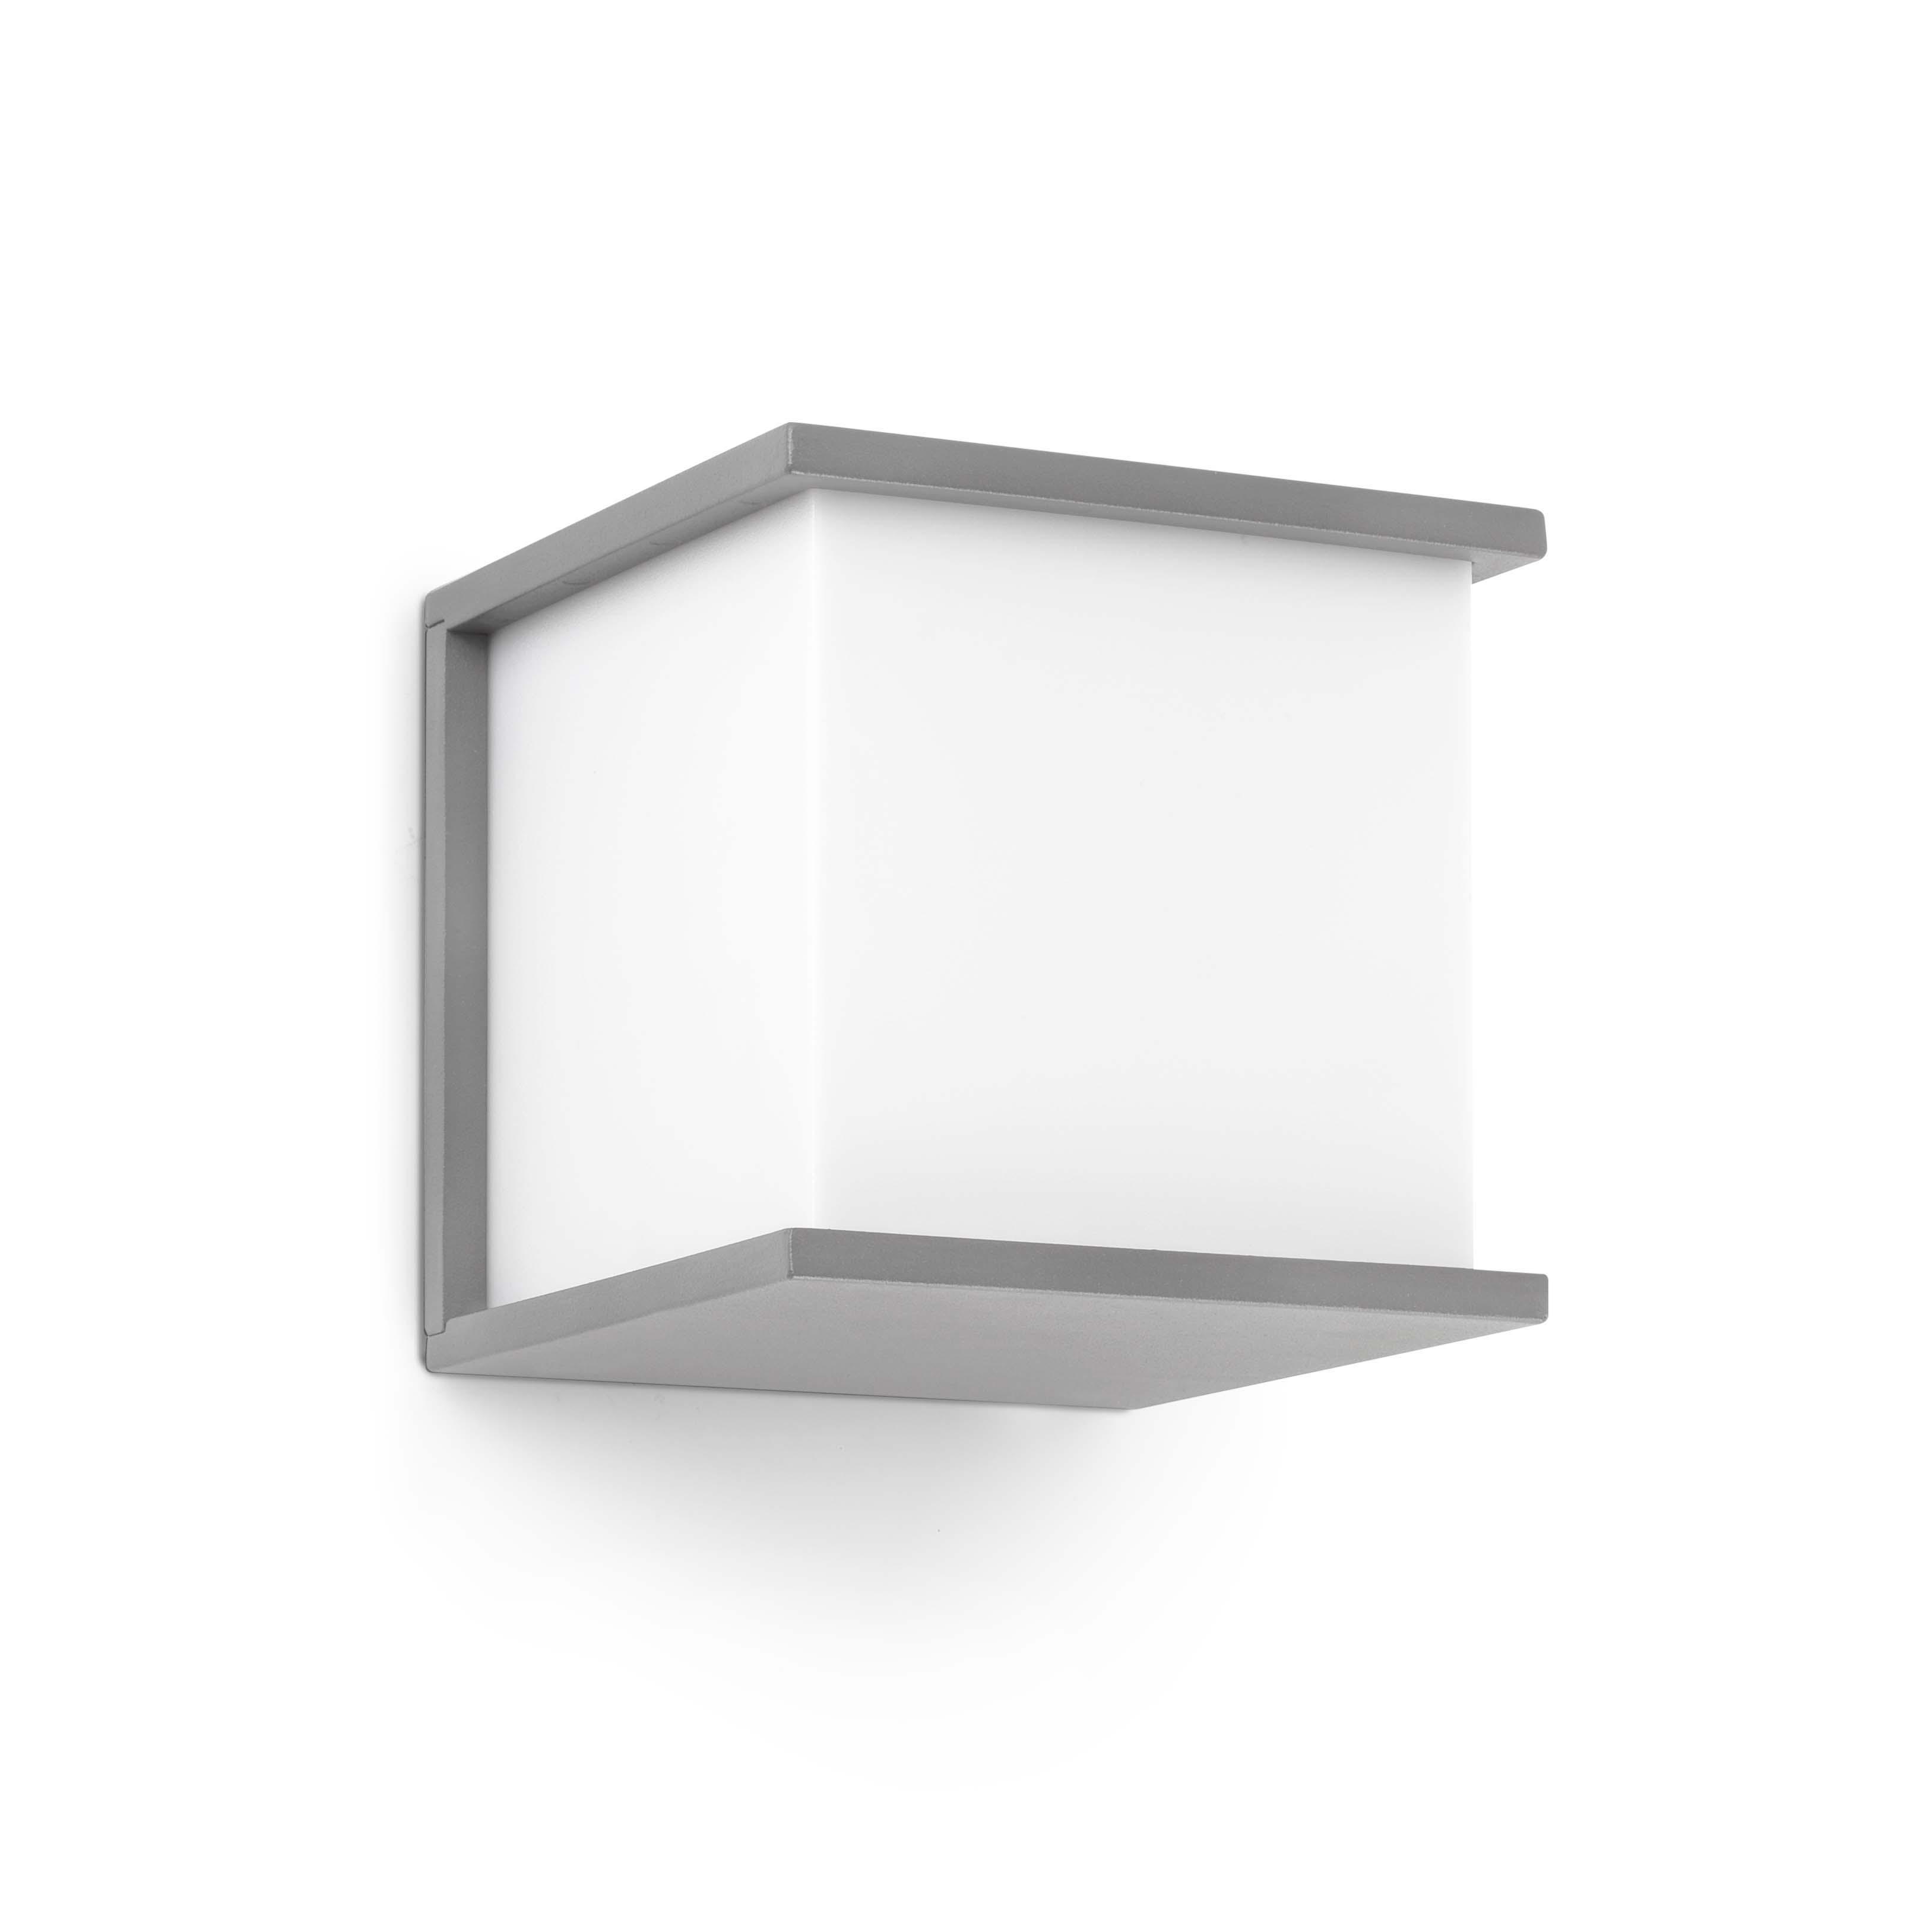 Kubick Aplique Exterior 1xE27 60w Gris claro